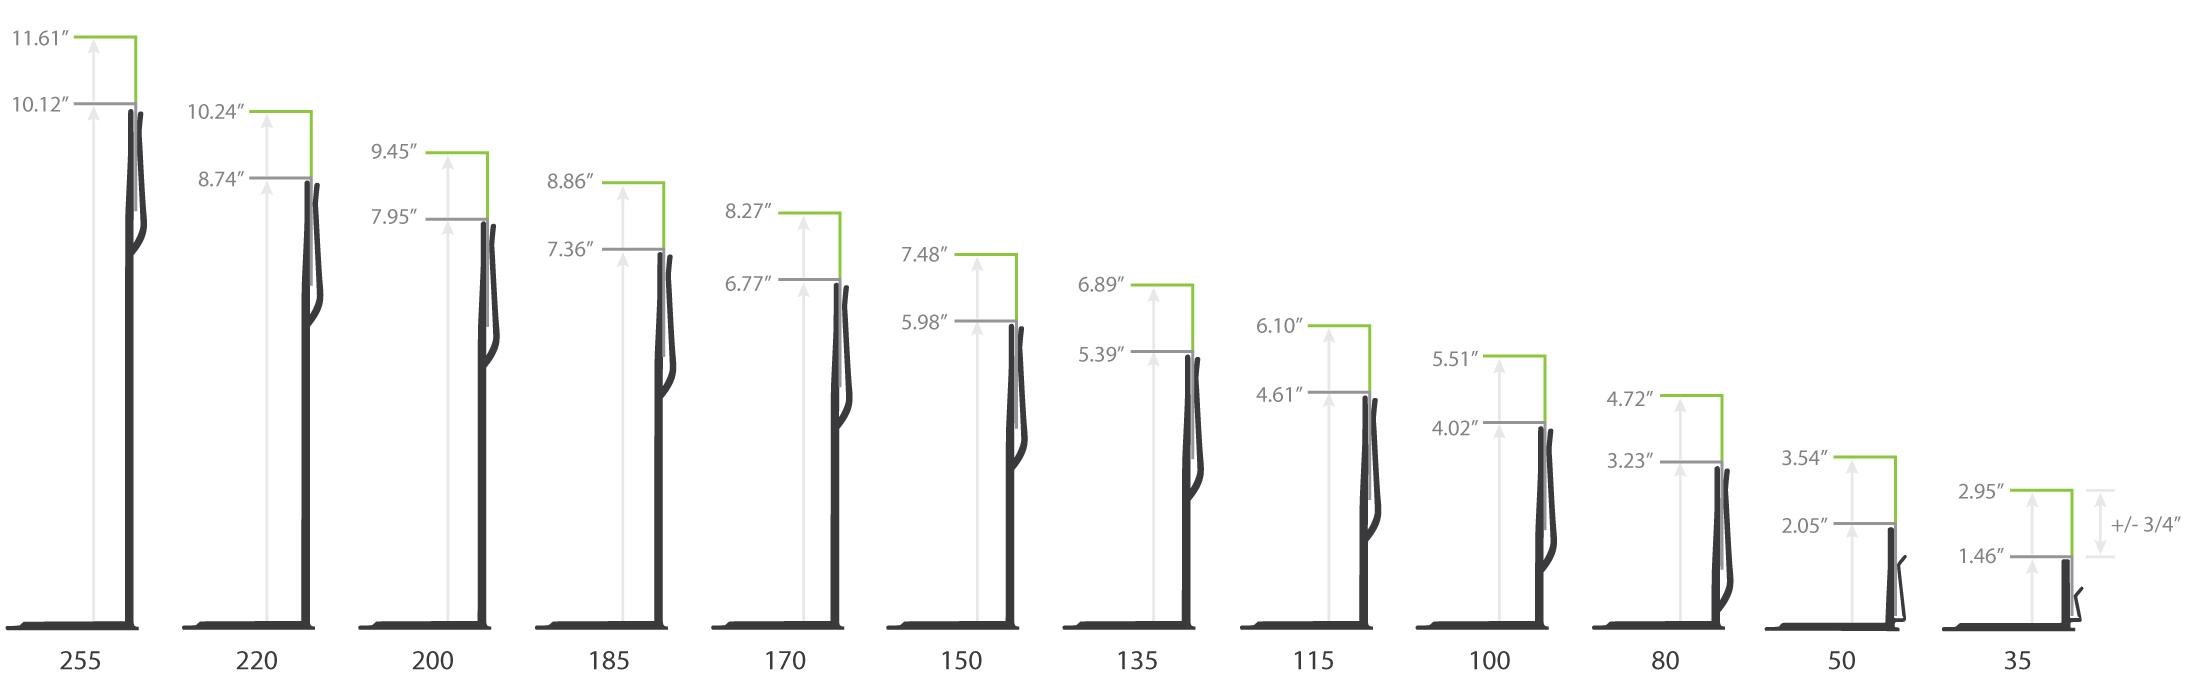 Alpha V Bracket Adjustability Chart